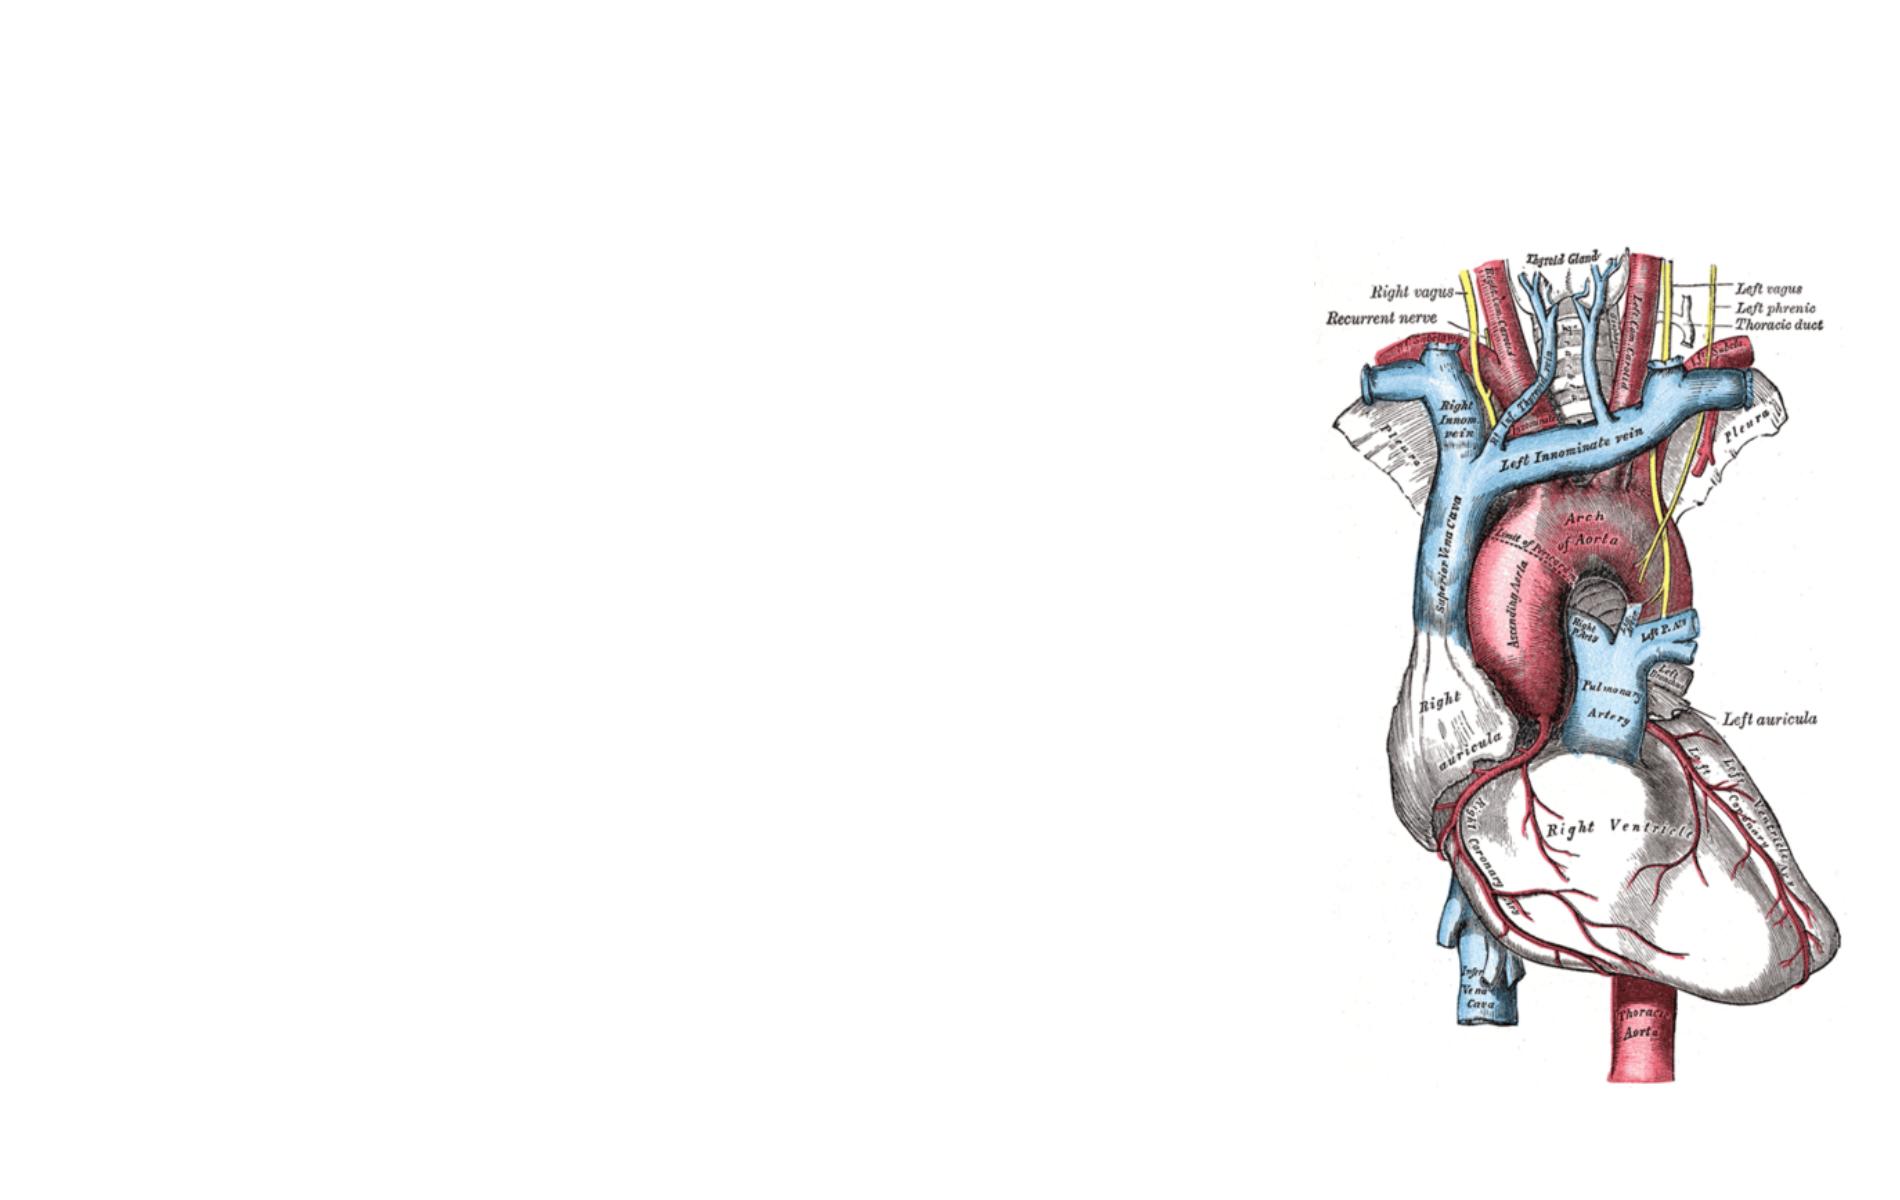 anatomy wallpaper background - photo #23